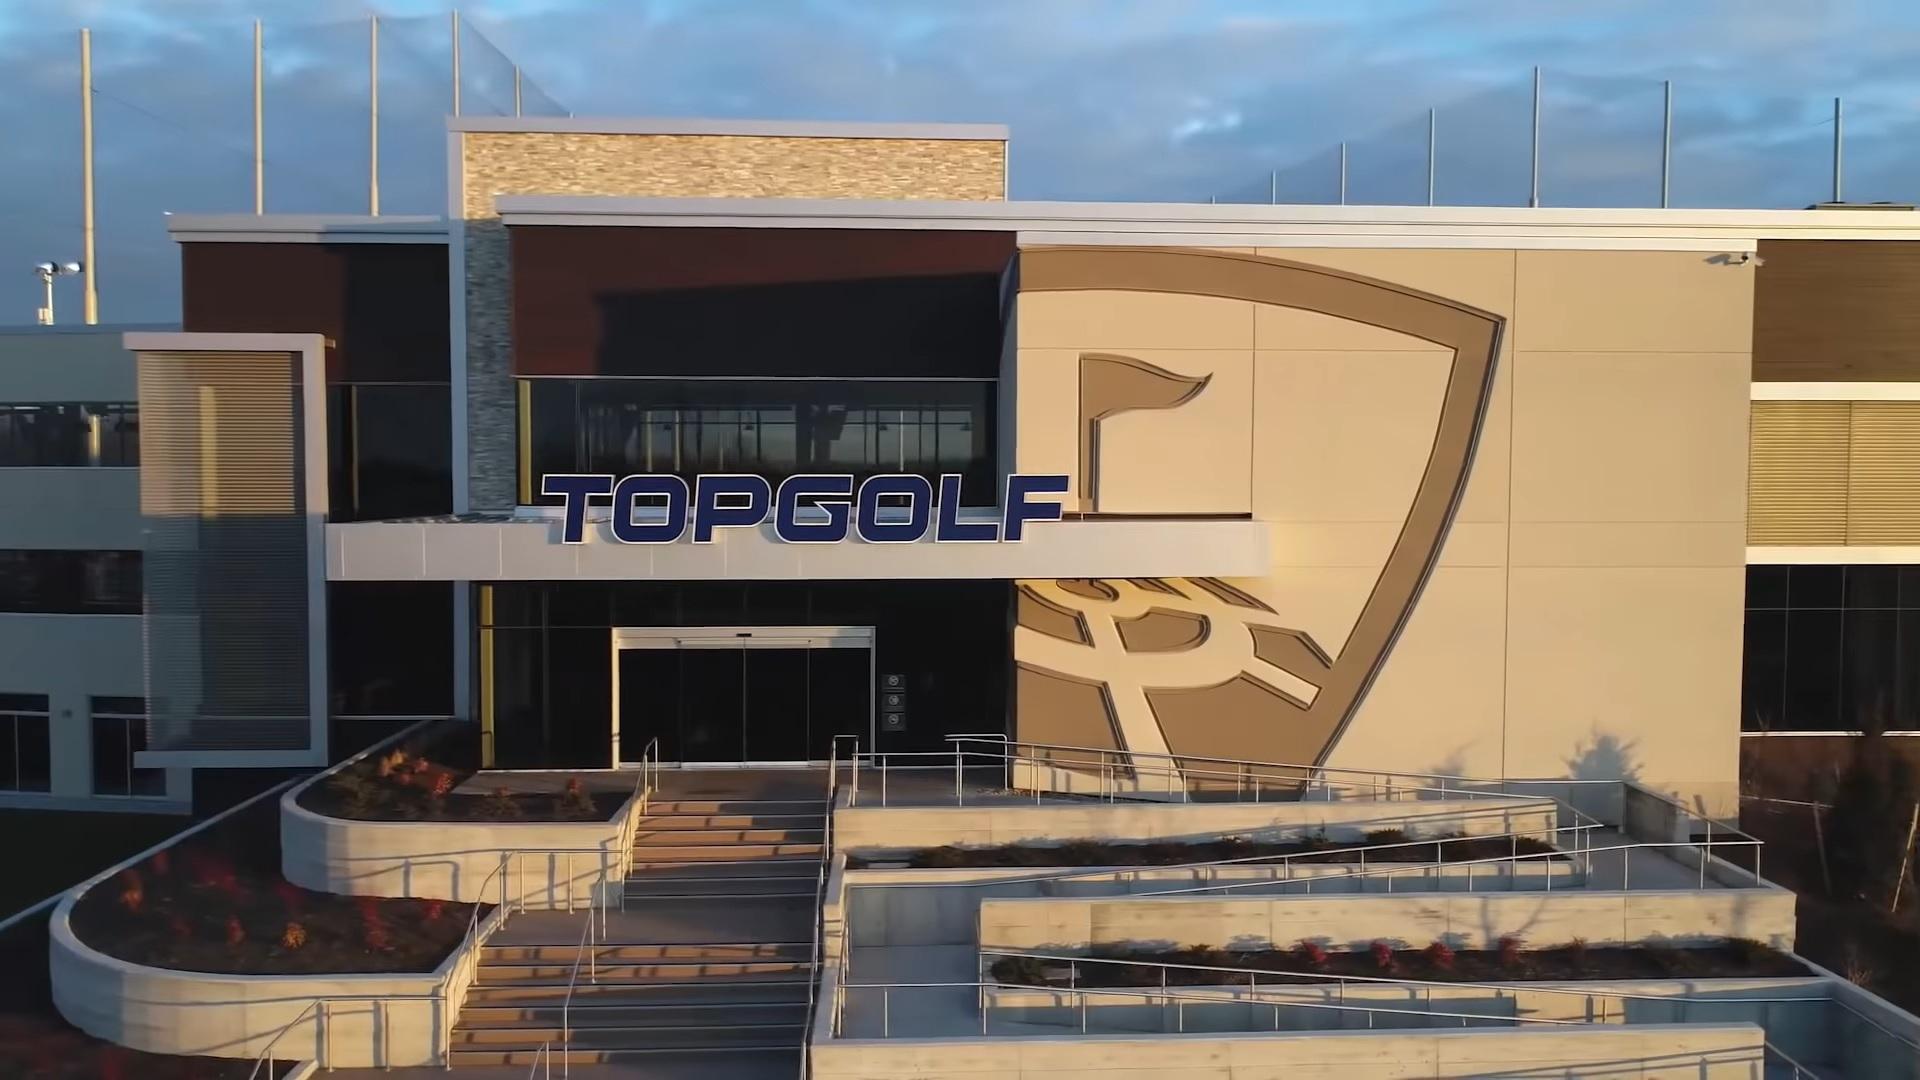 Topgolf 2201 E 4th St Fort Worth Tx 76102 Yp Com